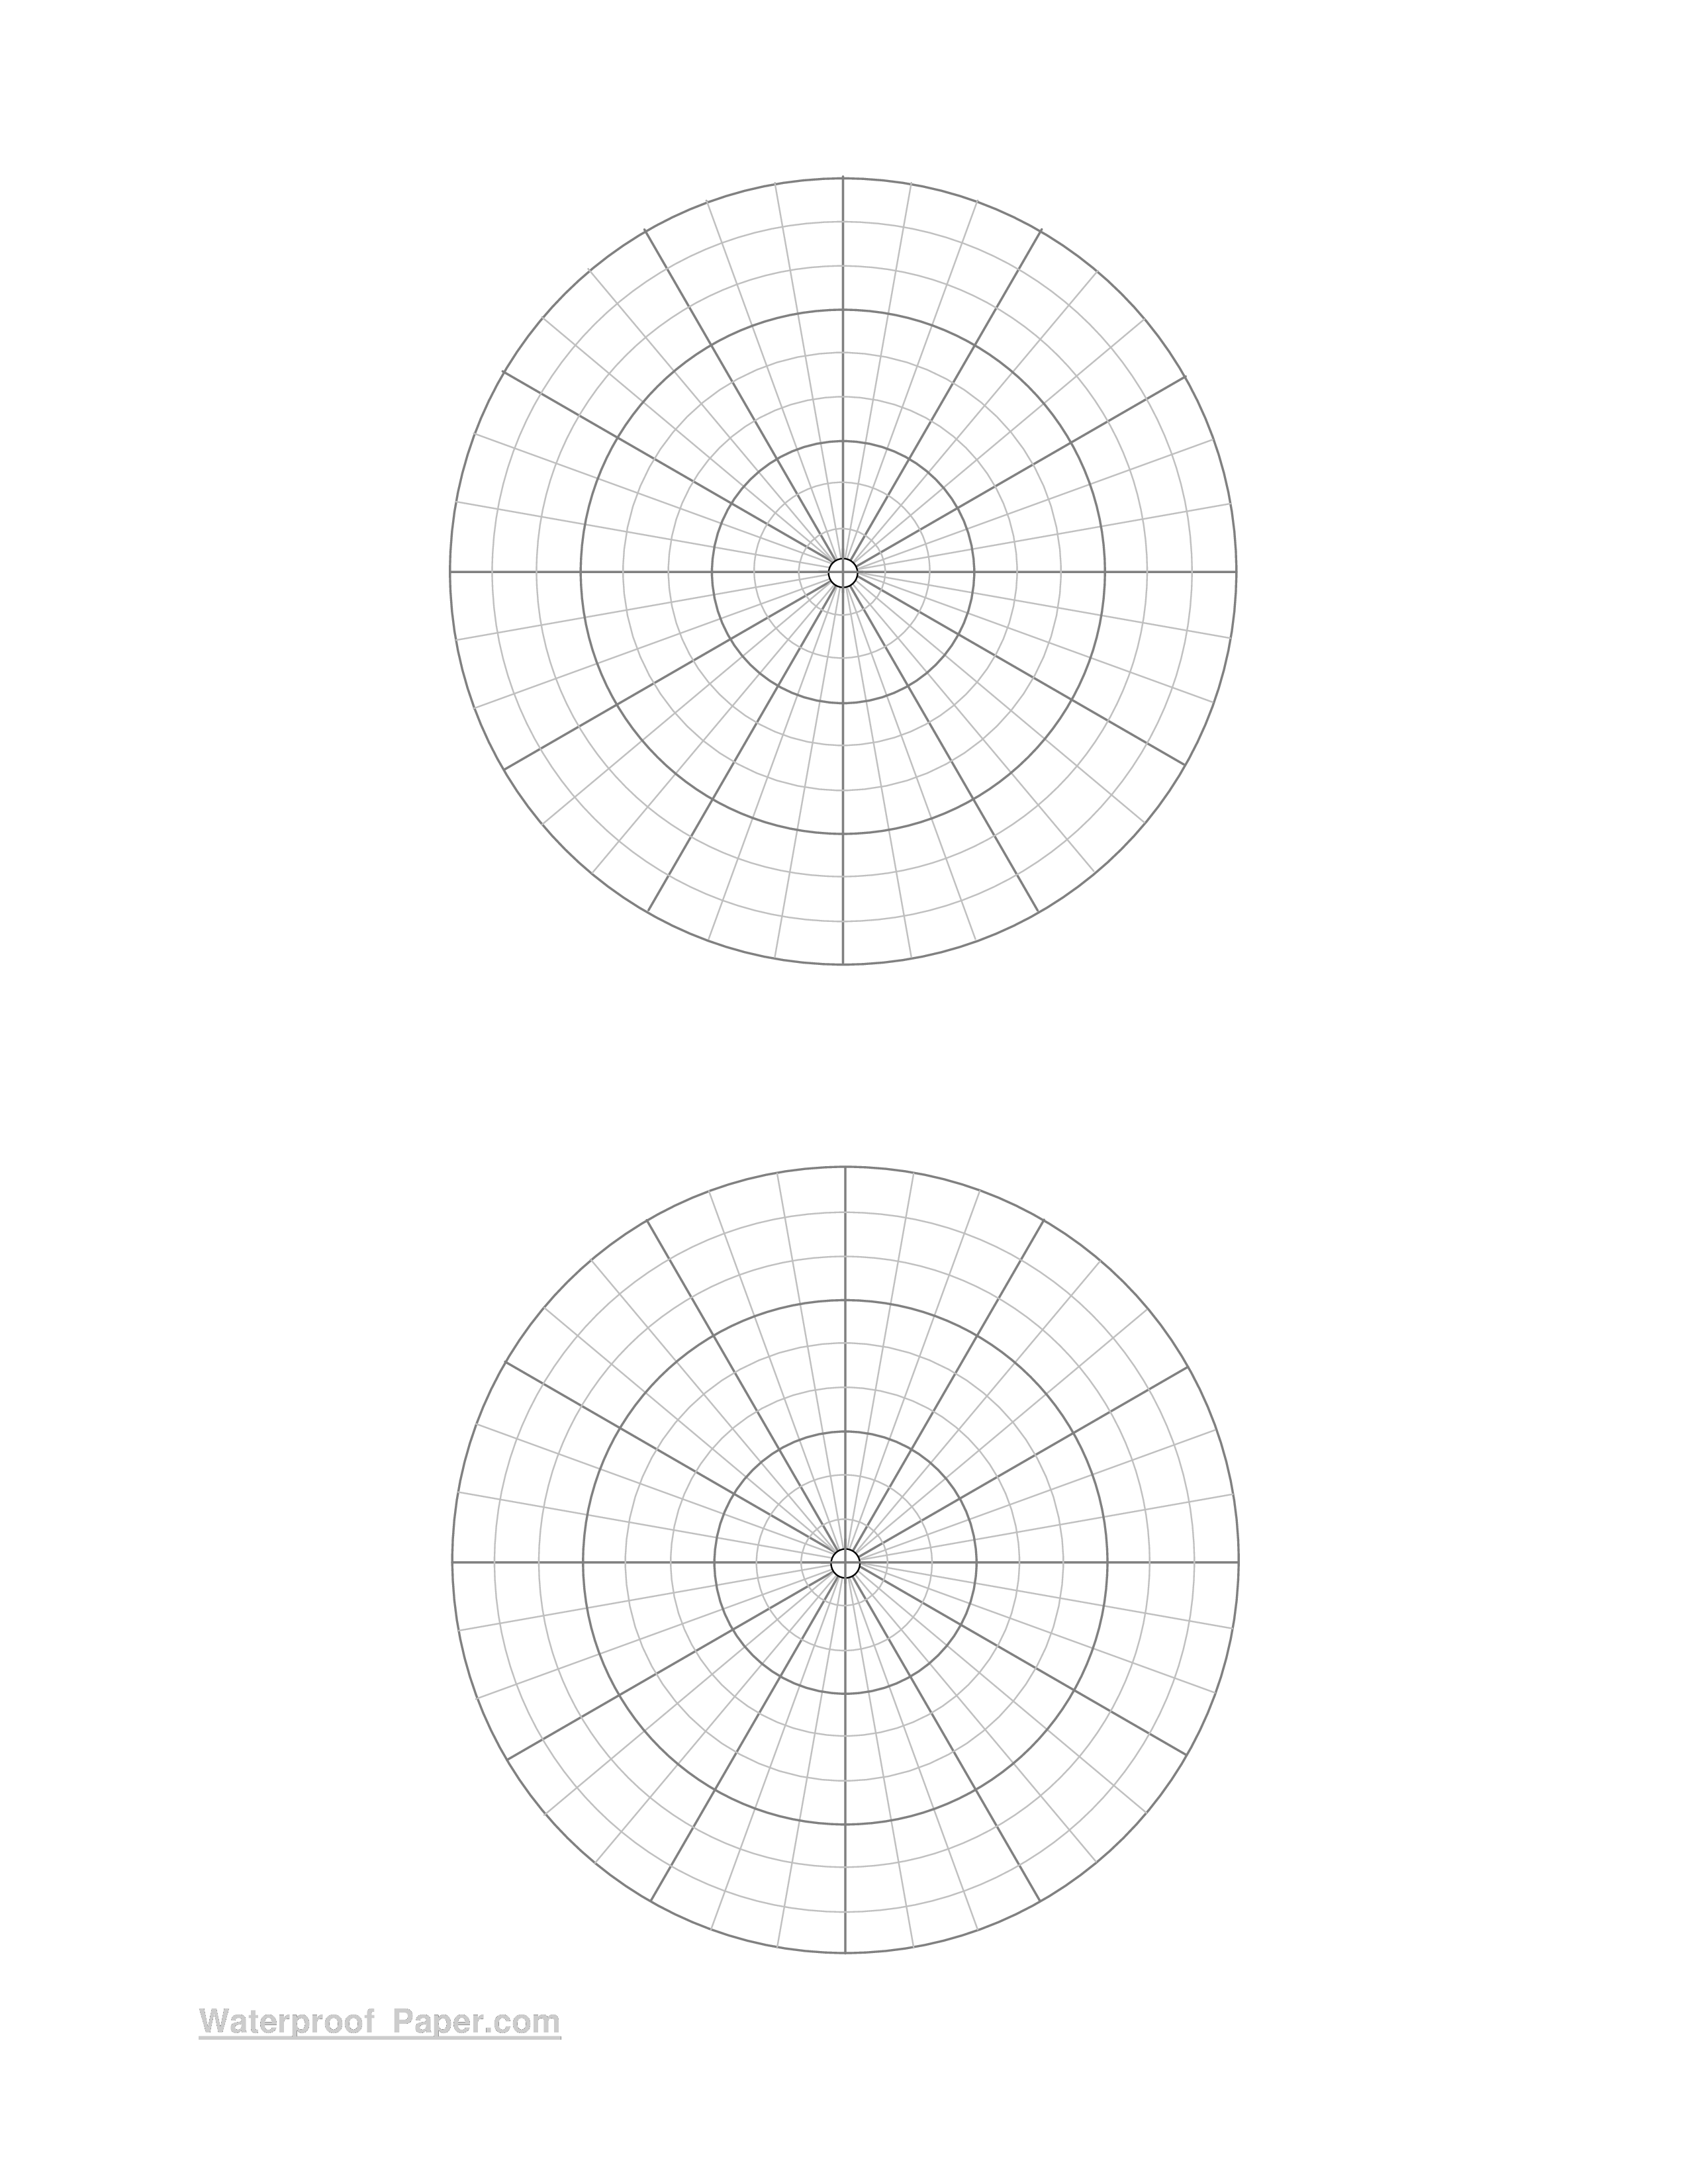 Free Printable Polar Coordinate Graph Paper Templates At